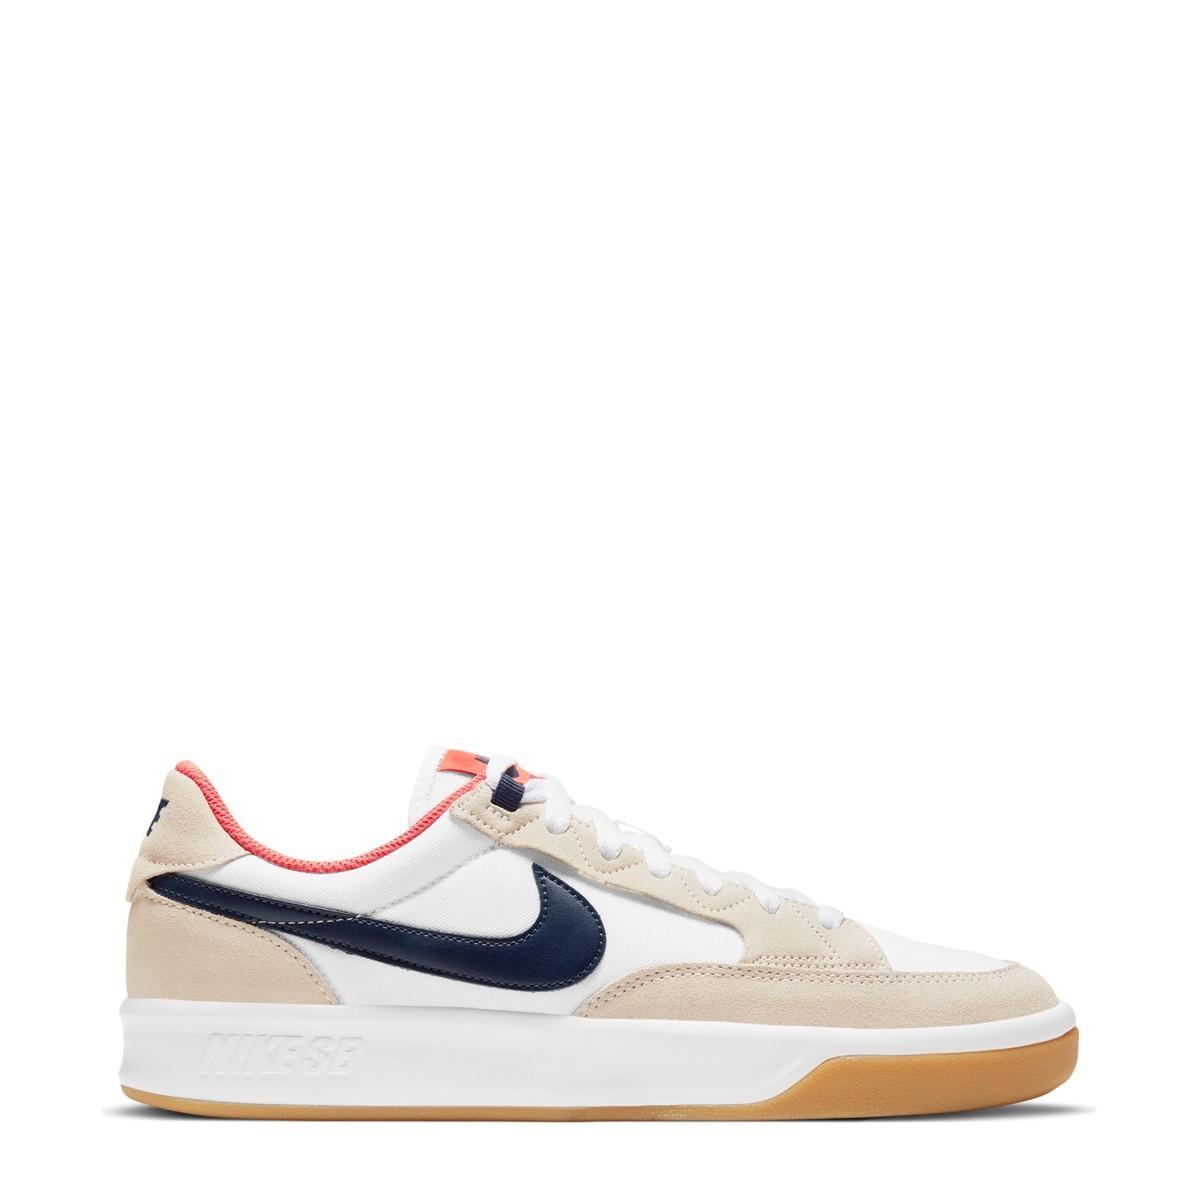 Nike SB Adversary Premium Erkek Ayakkabısı CW7456-102